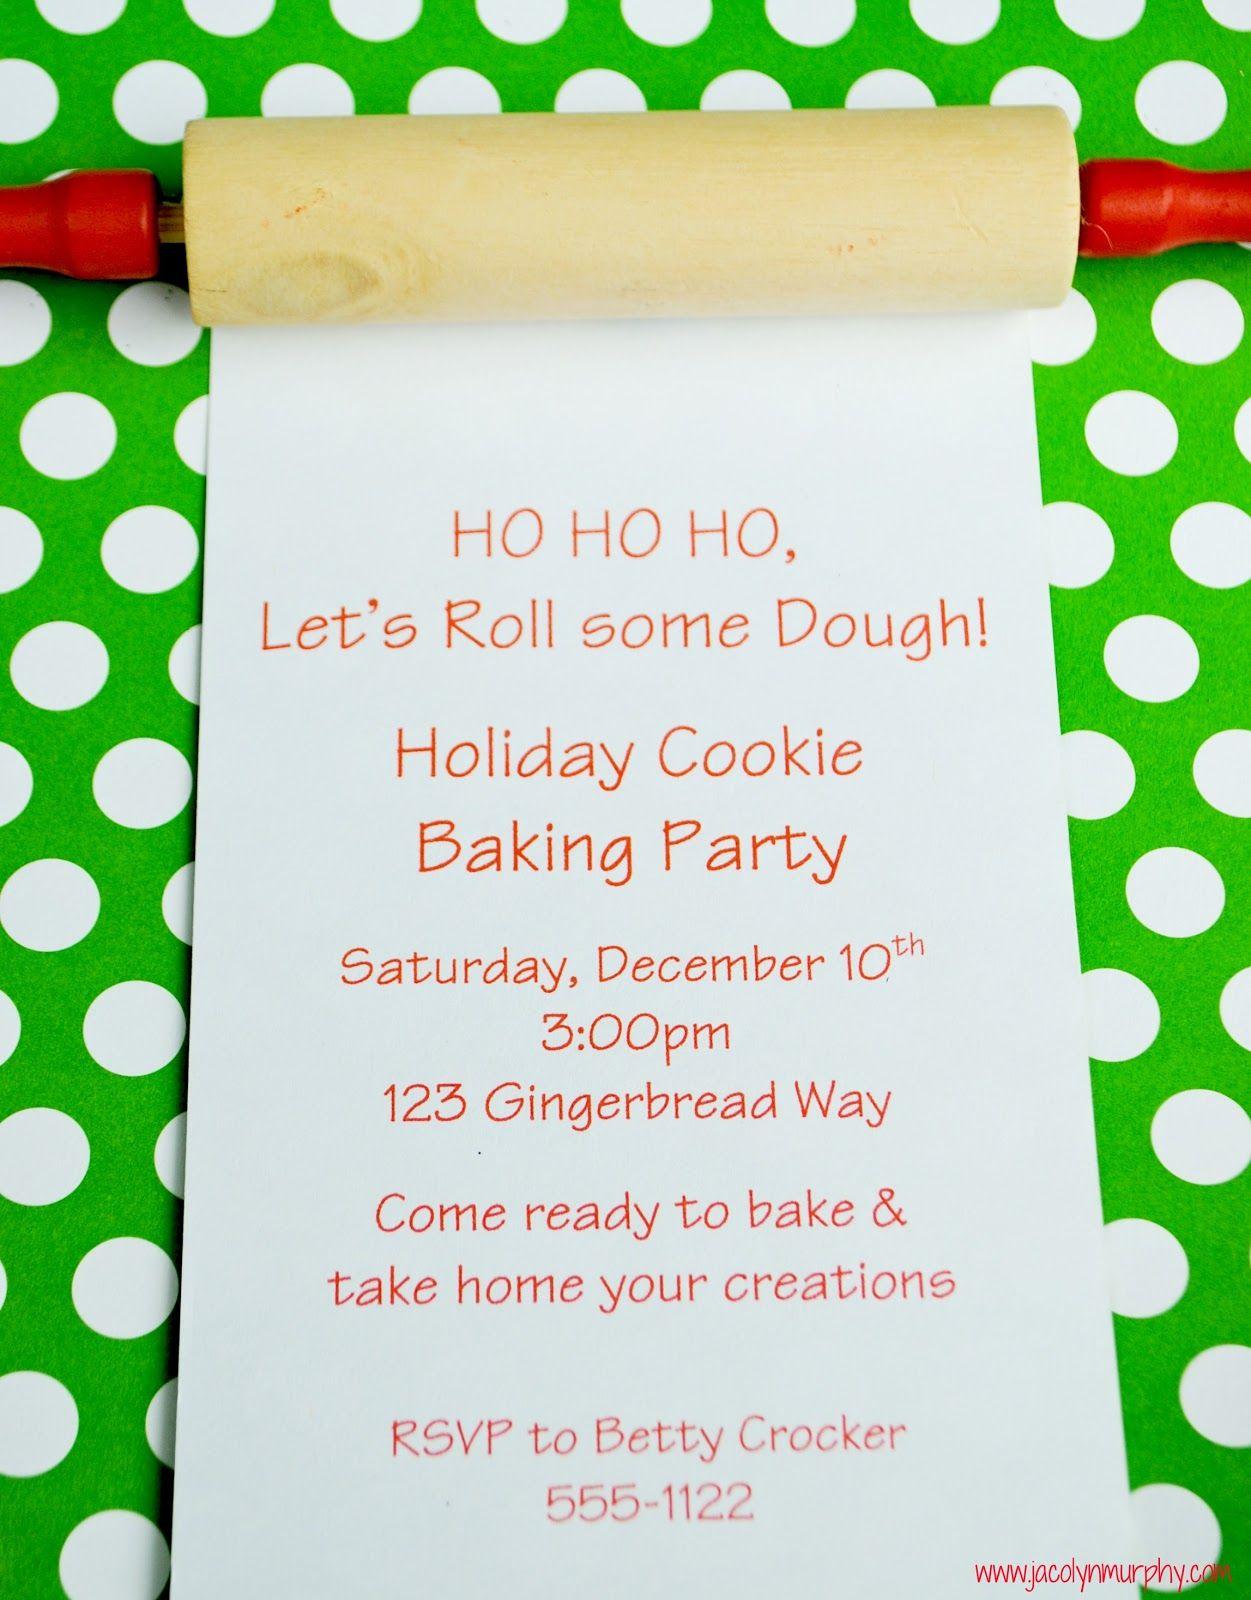 Dough Dough Dough...Happy Holiday Baking! | Invitation ideas ...